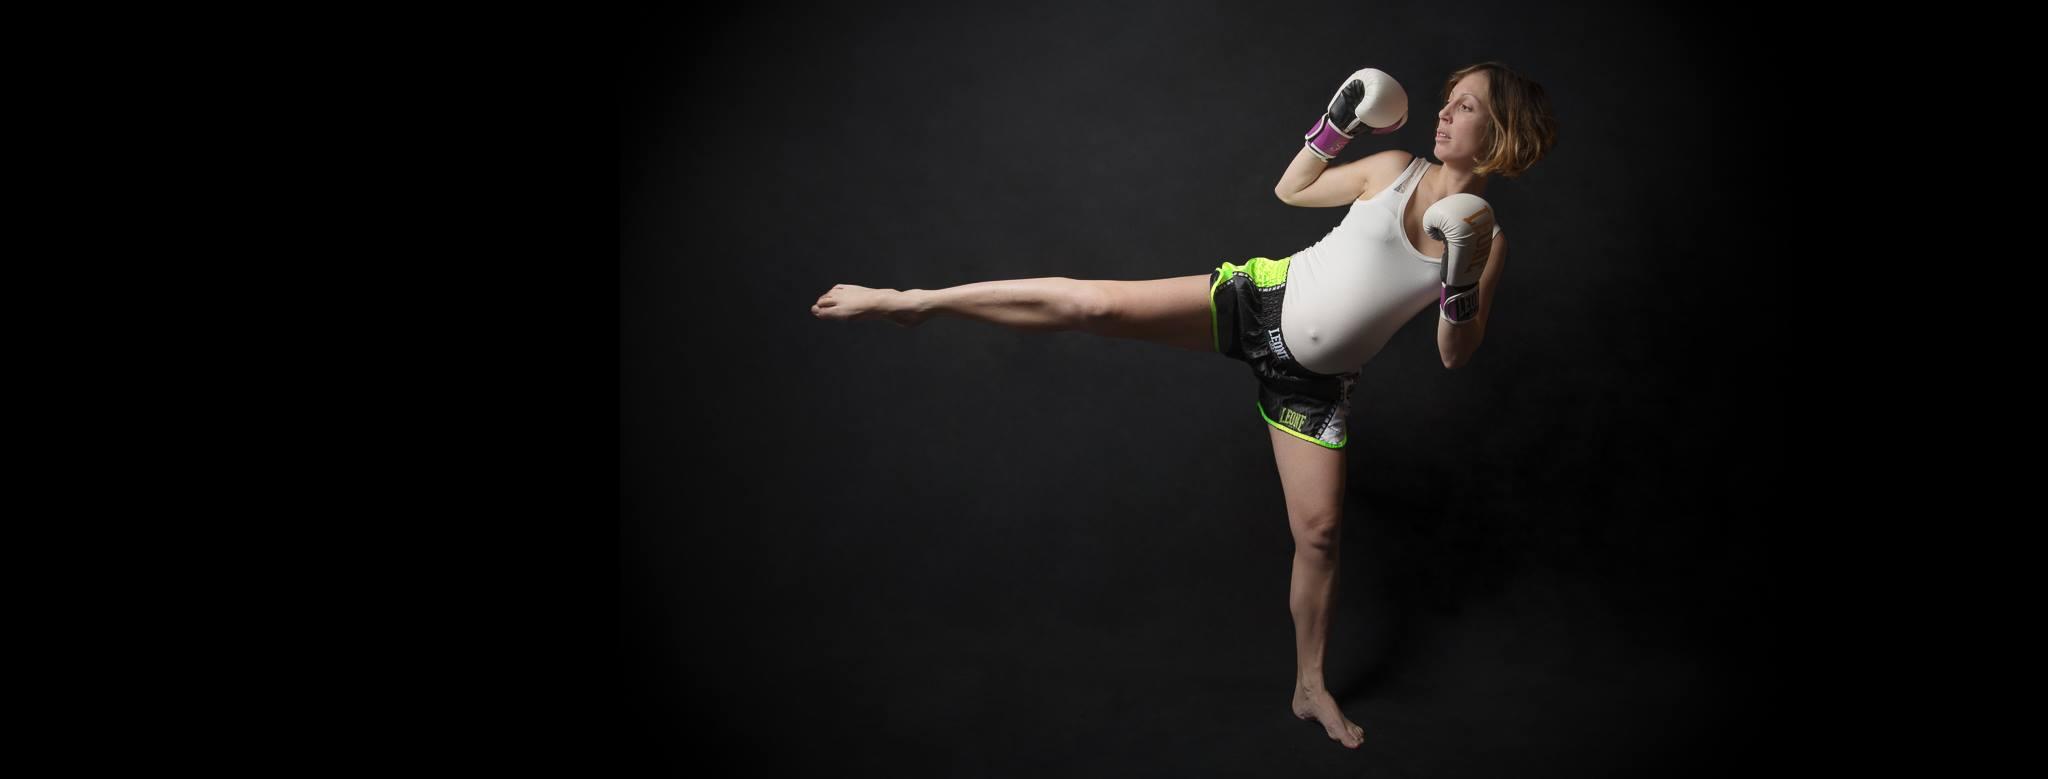 Marie pierre Anstett Boxe Championnat de France Sanda Elite  Wushu - 56 kg